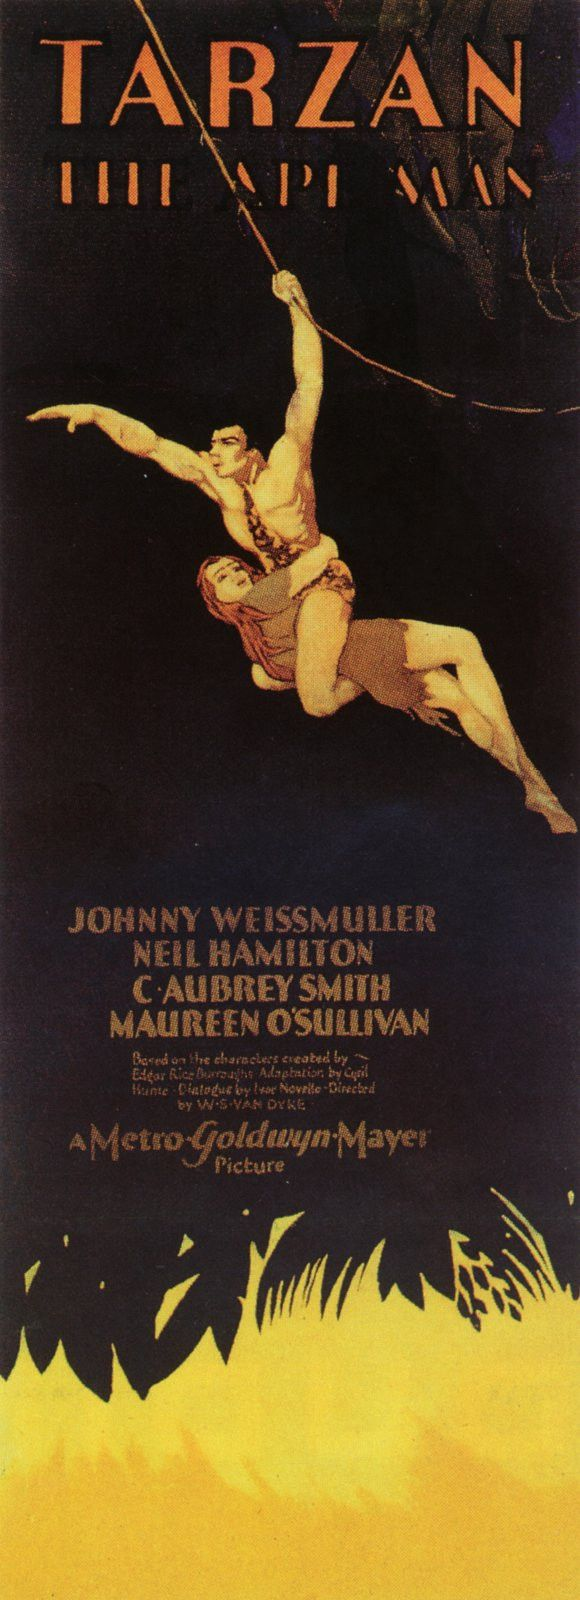 4/13/16  7:22a  MGM ''Tarzan The Ape Man''  Johnny Weismuller   Neil Hamilton C. Aubrey Simth  Maureen O'Sullivan Released: 3/25/1932 etriggerz.com